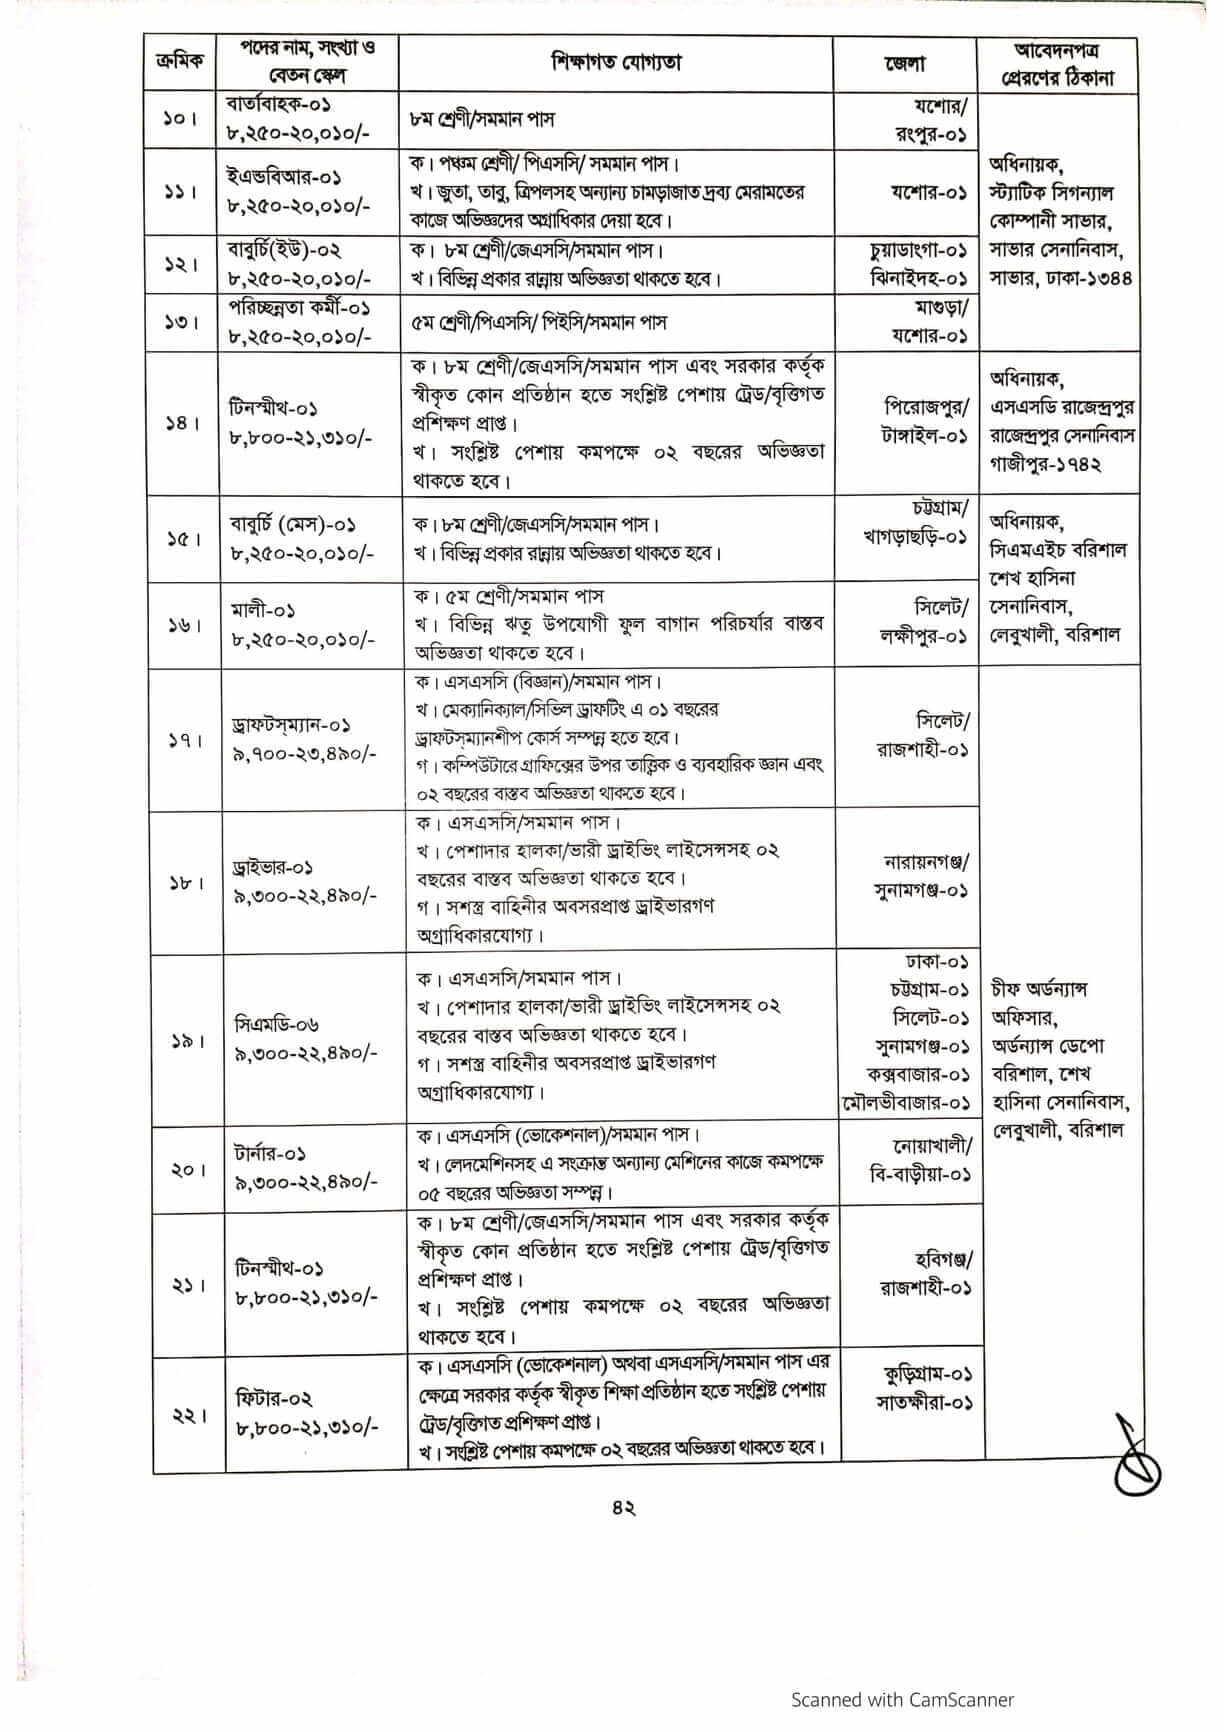 Bangladesh Army Civil Job Circular 2021 PDF Download